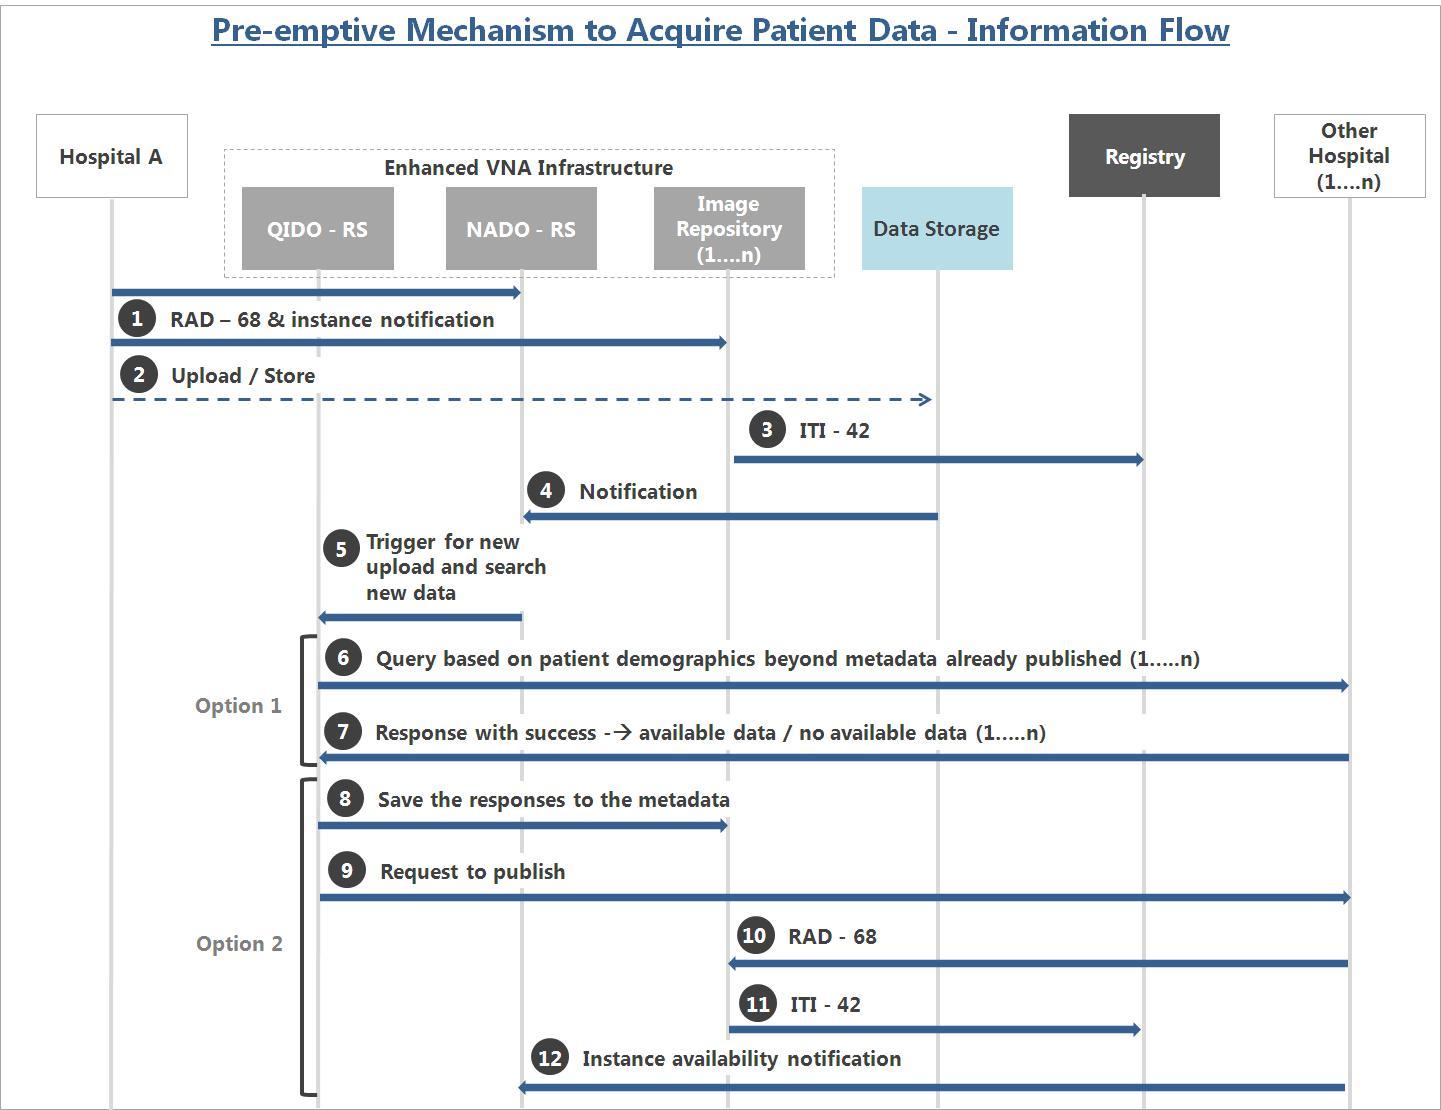 Vna Enhanced With Dicom Rs To Provide Preemptive Mechanisms To